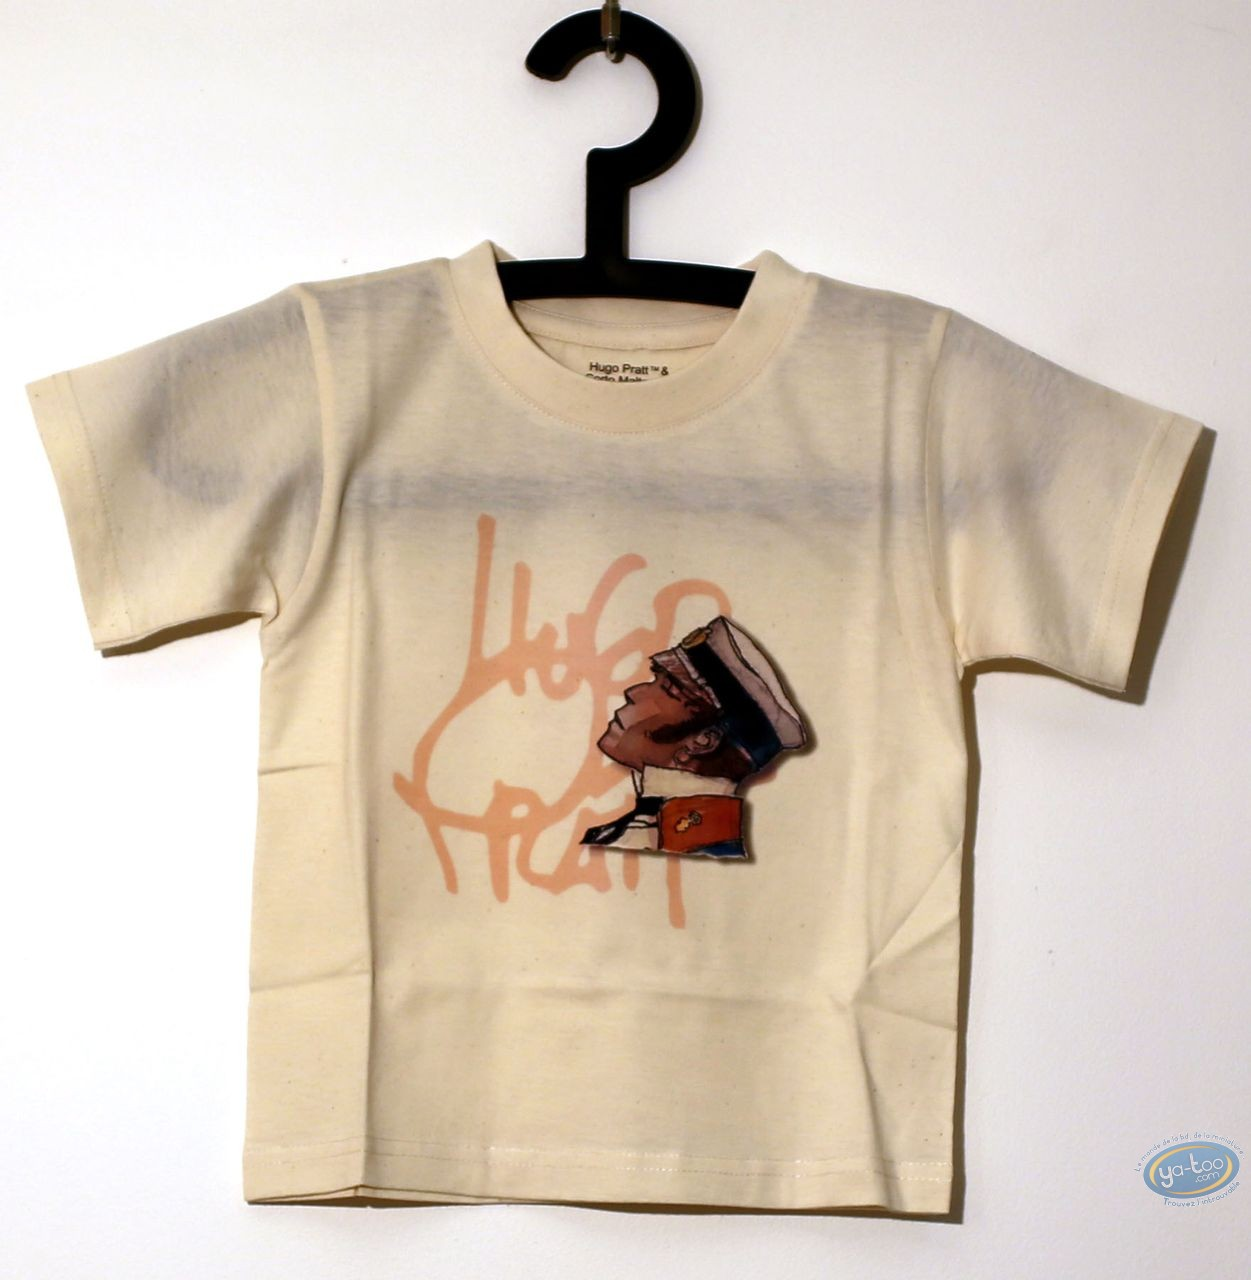 Vêtement, Corto Maltese : T-shirt, Kid 02/02 - 5/6 ans